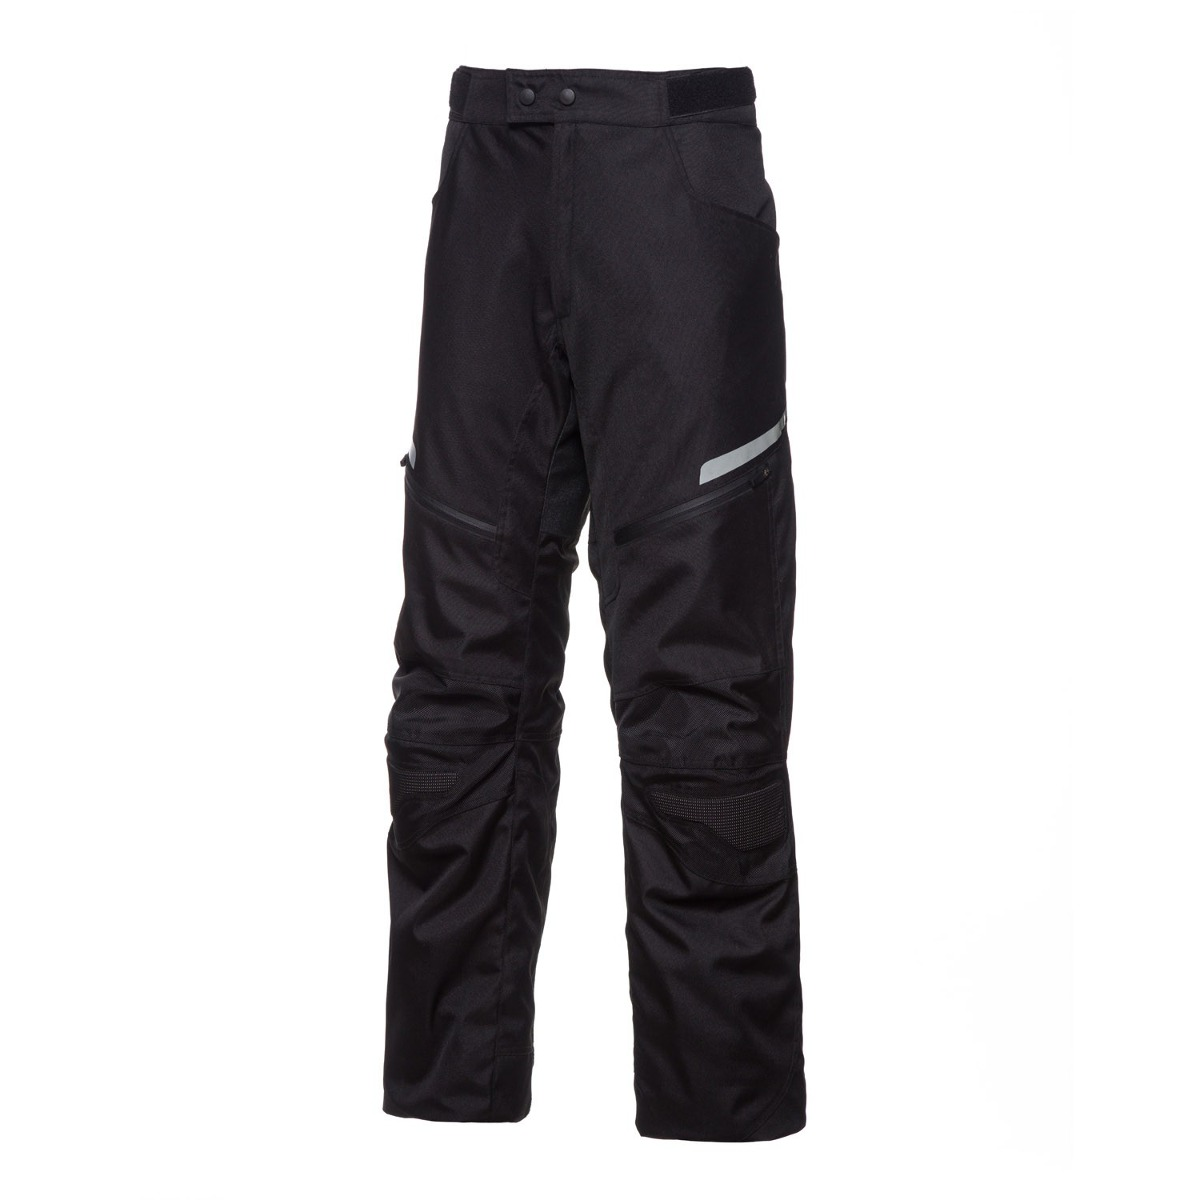 pantalon cordura fuse nineTOone by ls2 negro talle m